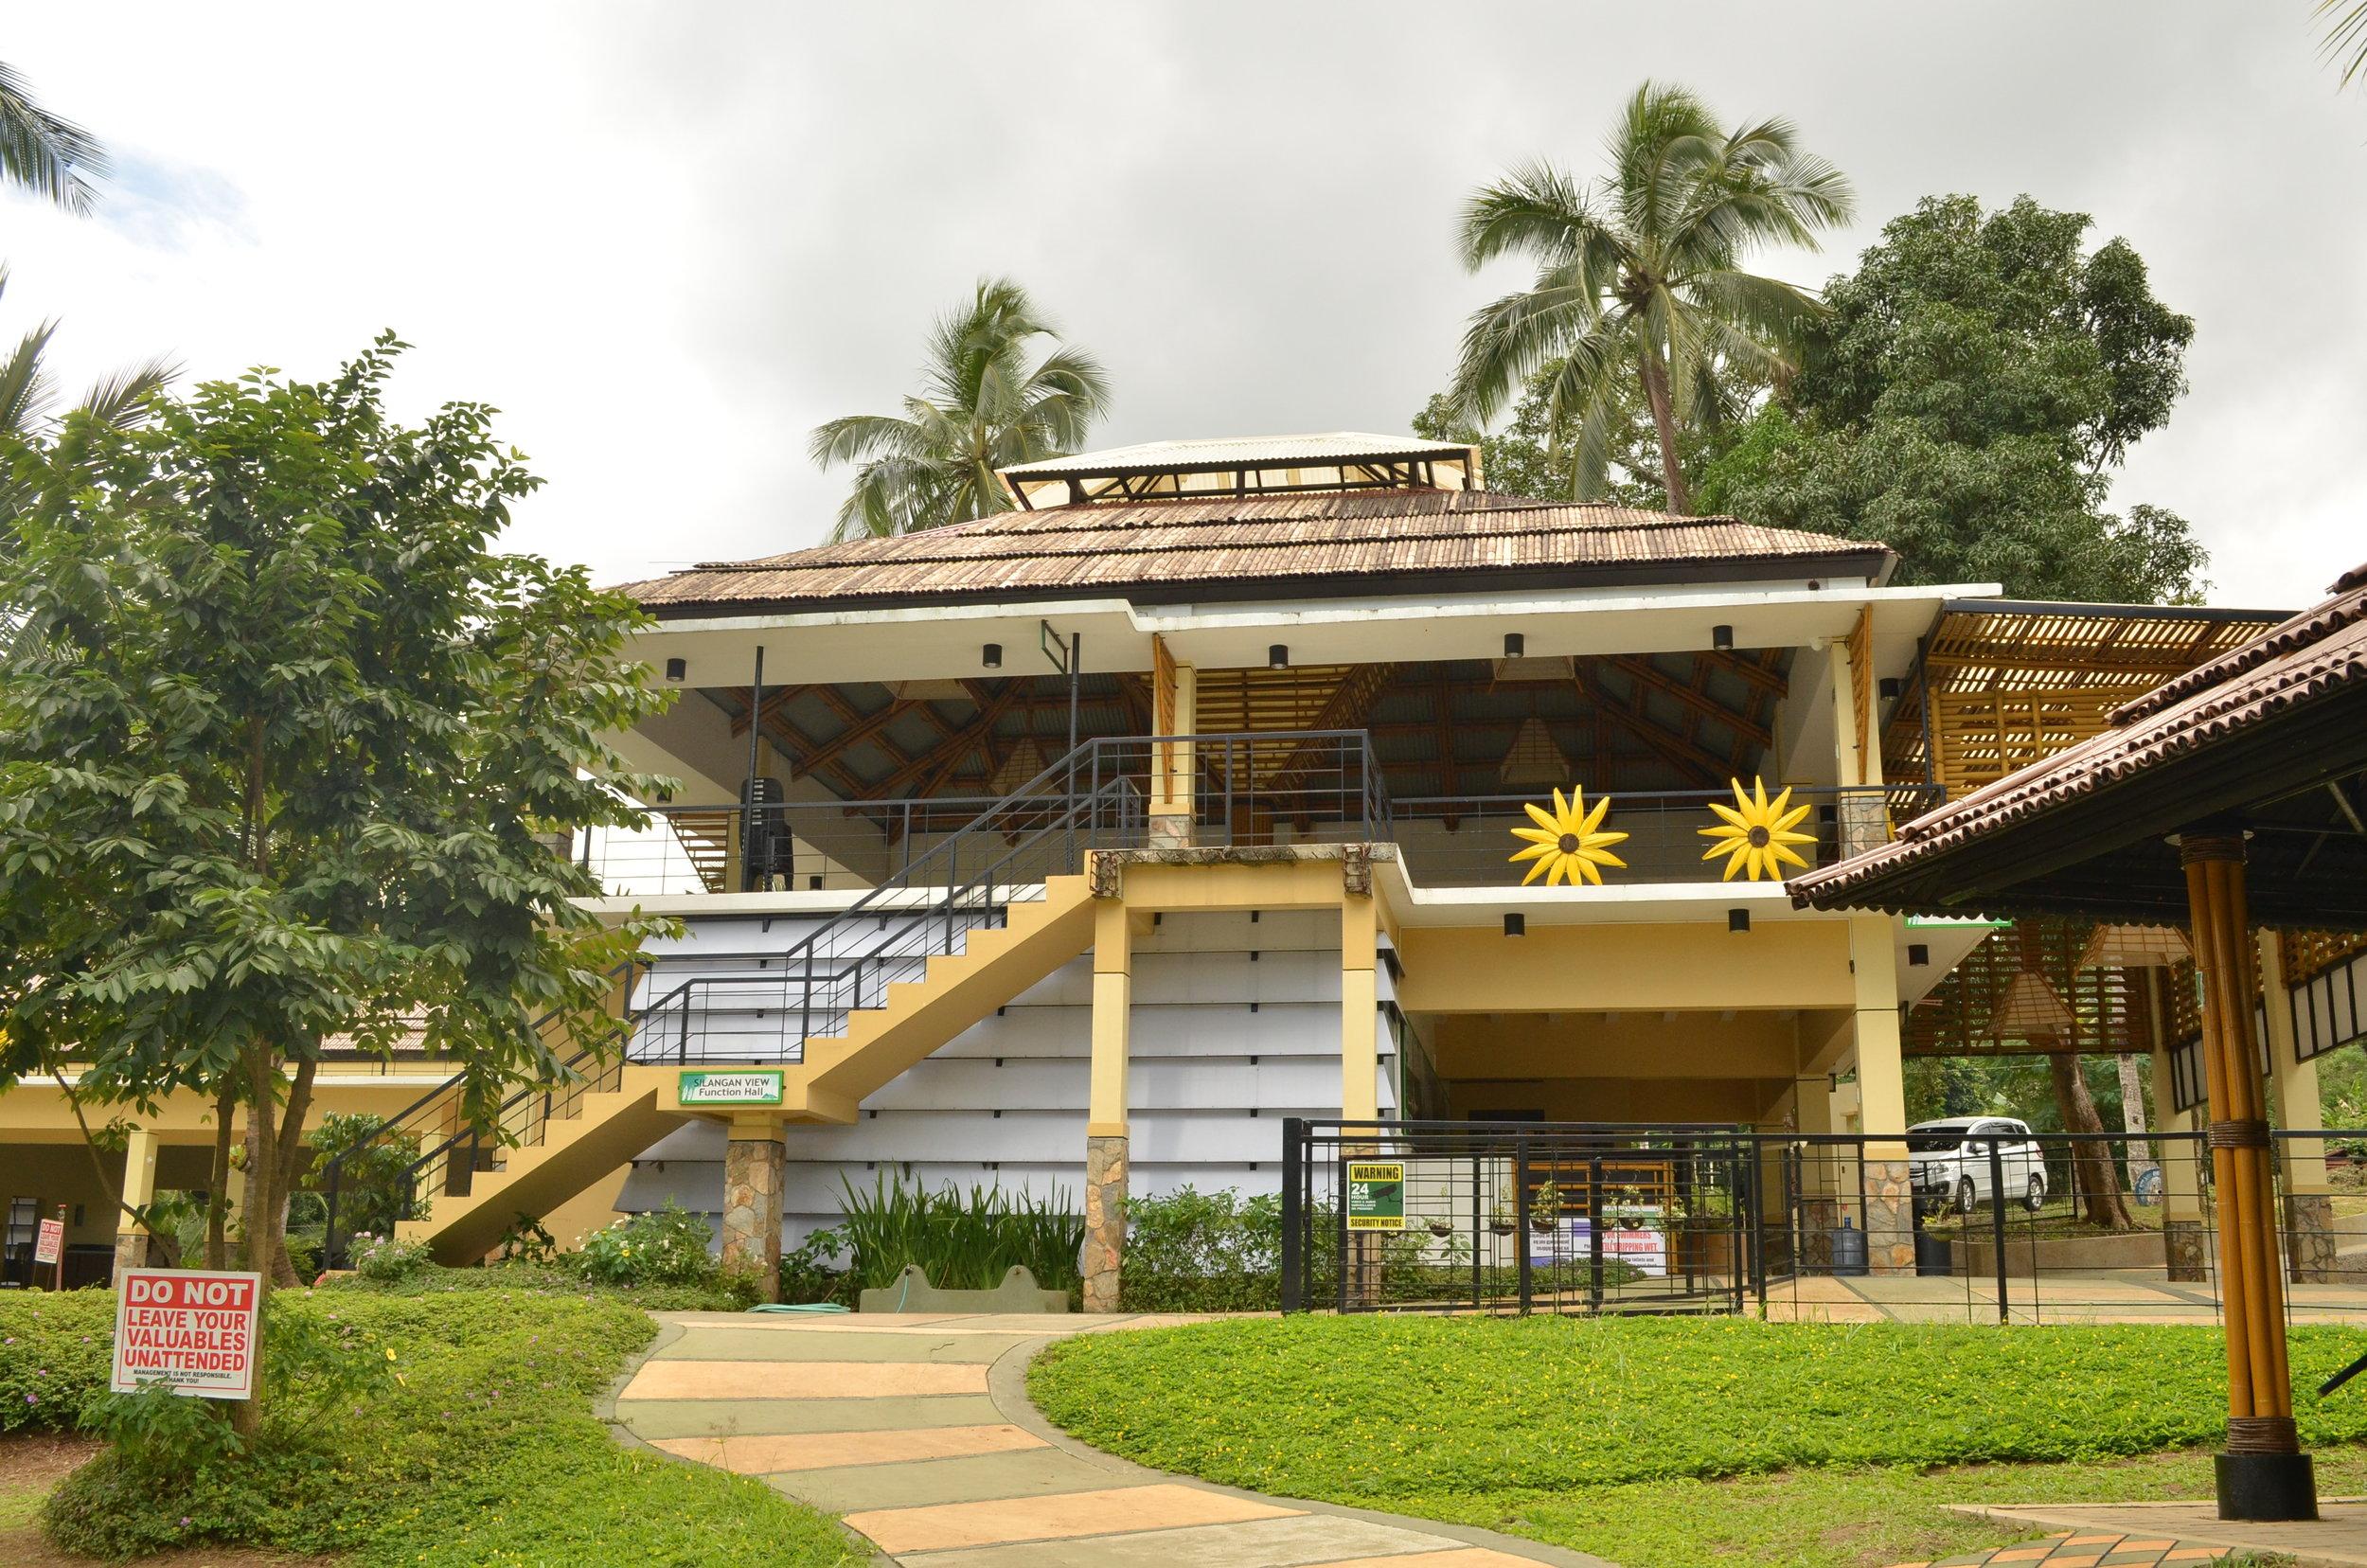 Silangan View - Adventure Park - P800.00 good for 10.JPG